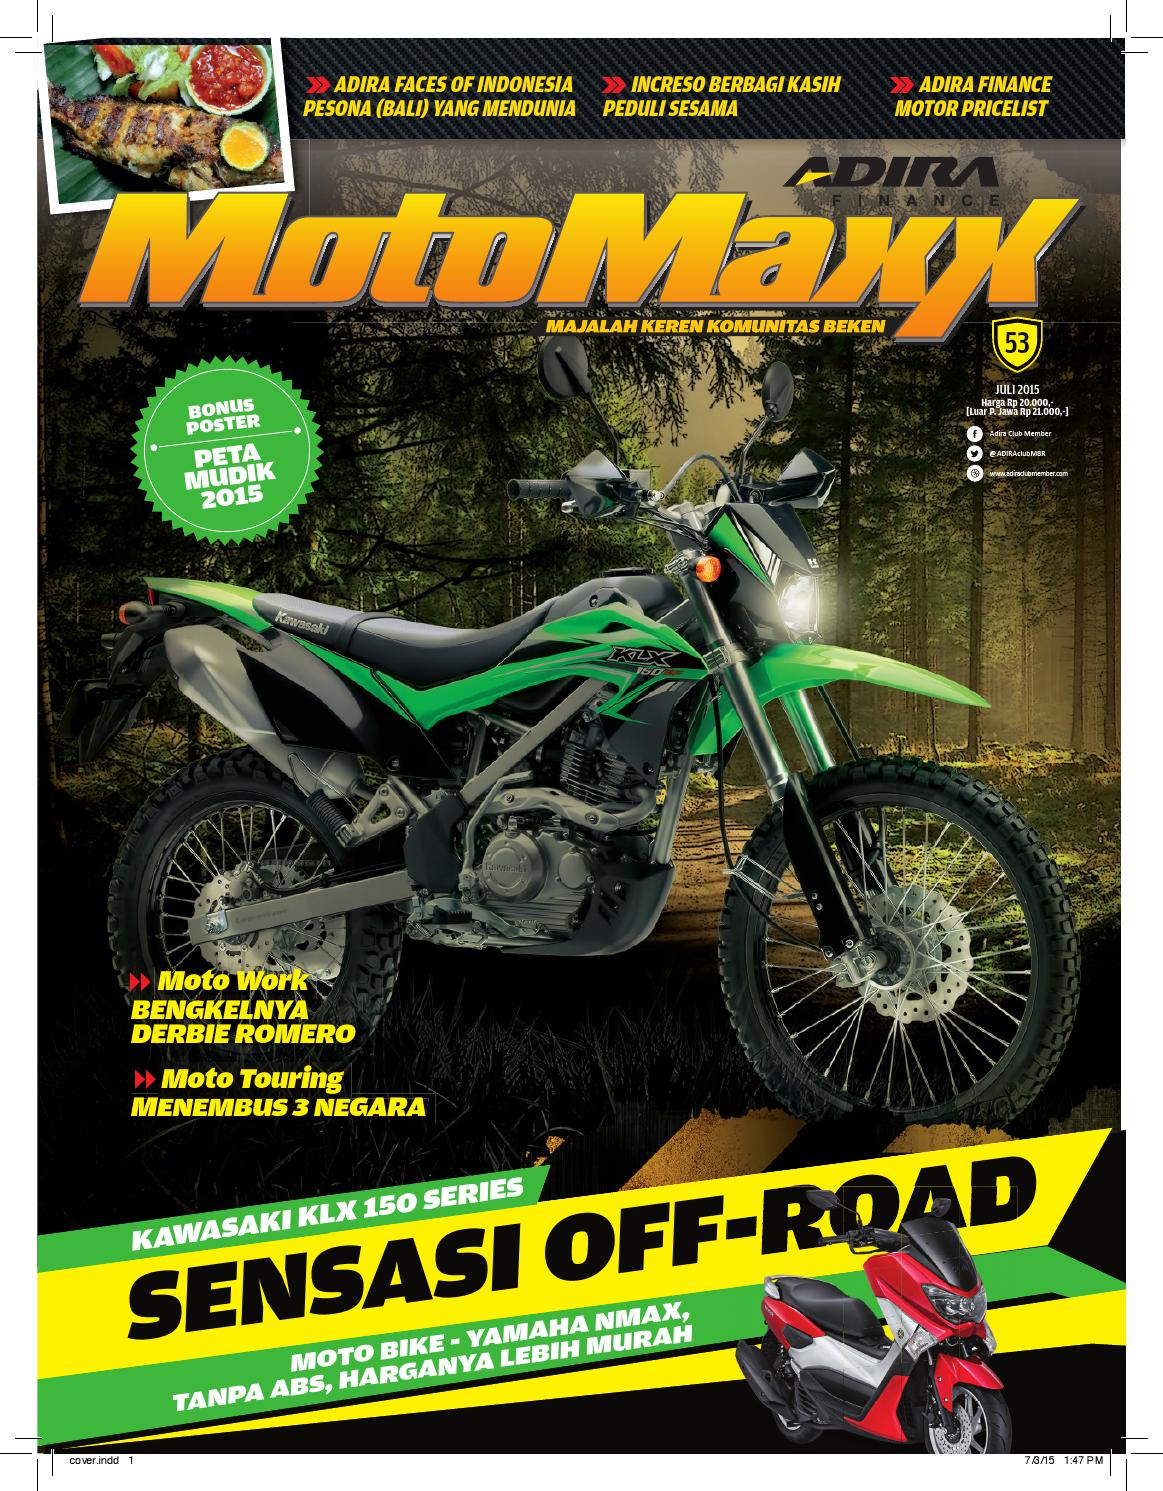 Motomaxx 07 2015 By Adira Member Issuu New Vario 125 Esp Cbs Titanium Black Sragen